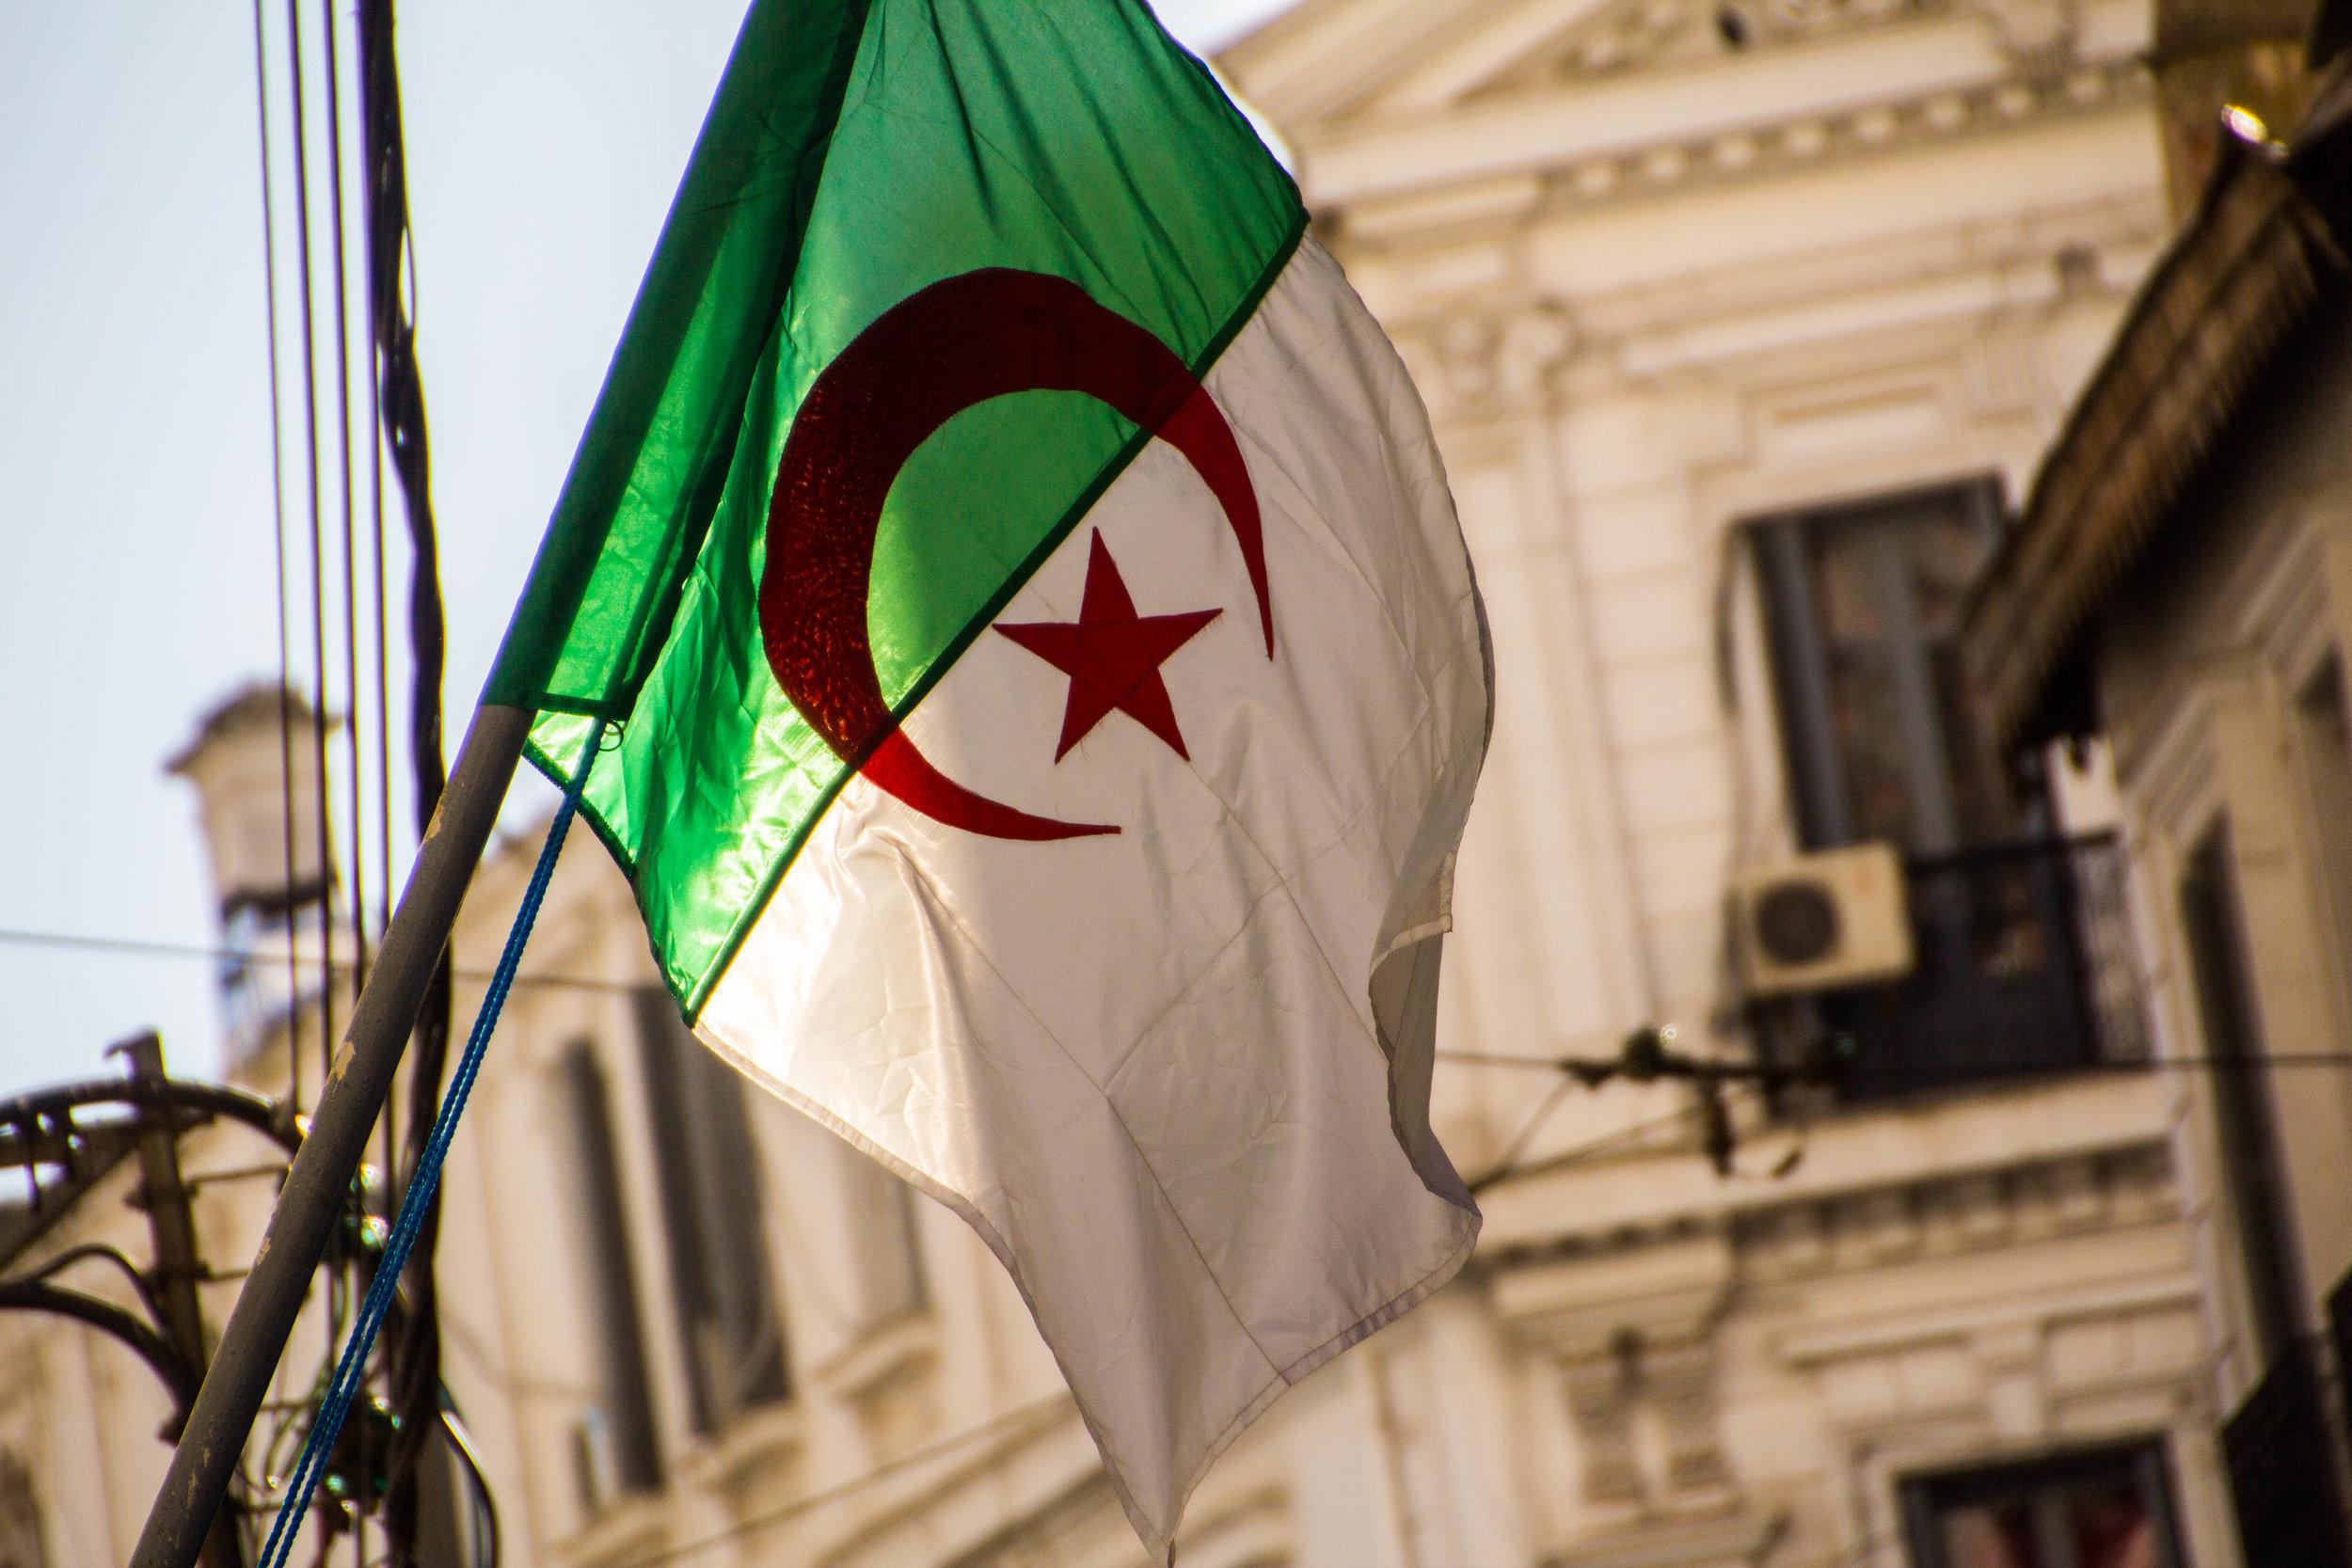 street-photography-algiers-algeria-37.jpg